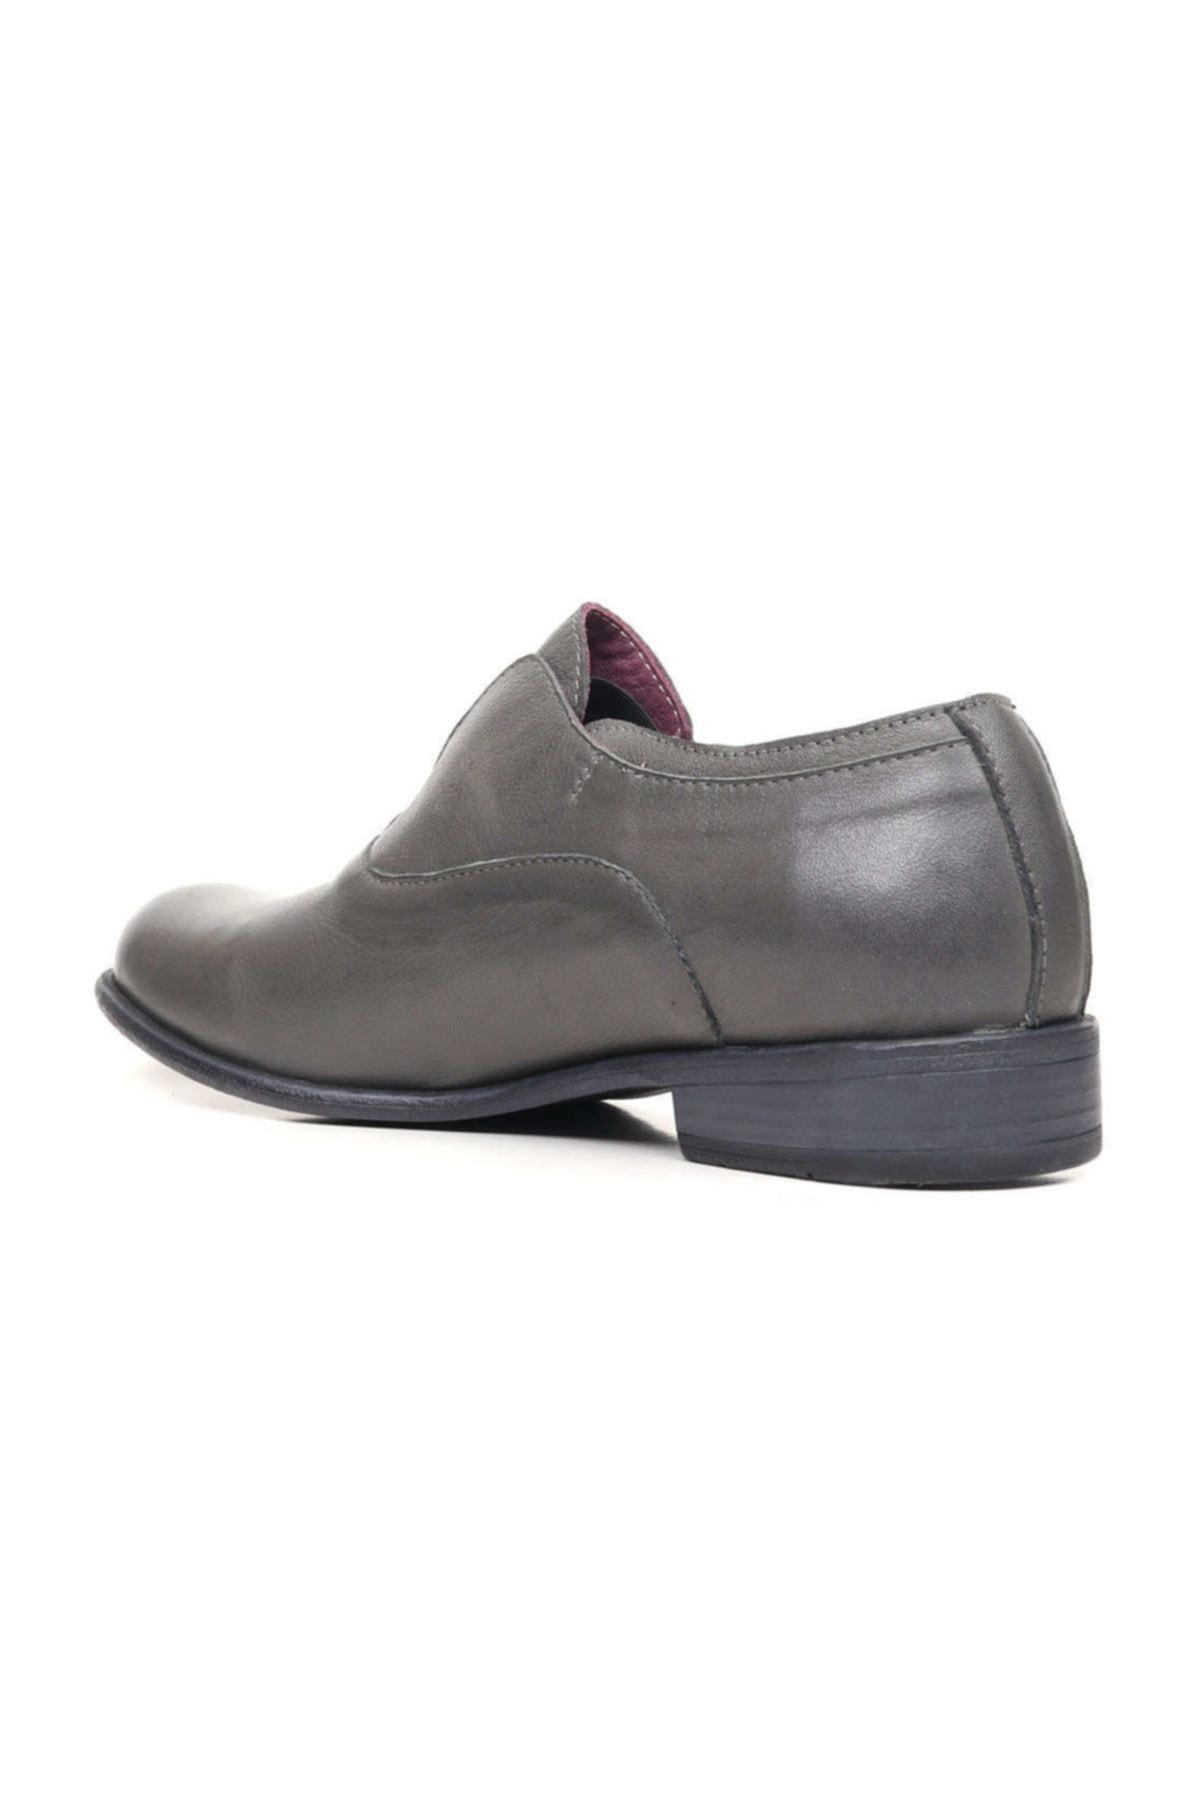 BUENO Shoes  Kadın Ayakkabı 9p1706 2